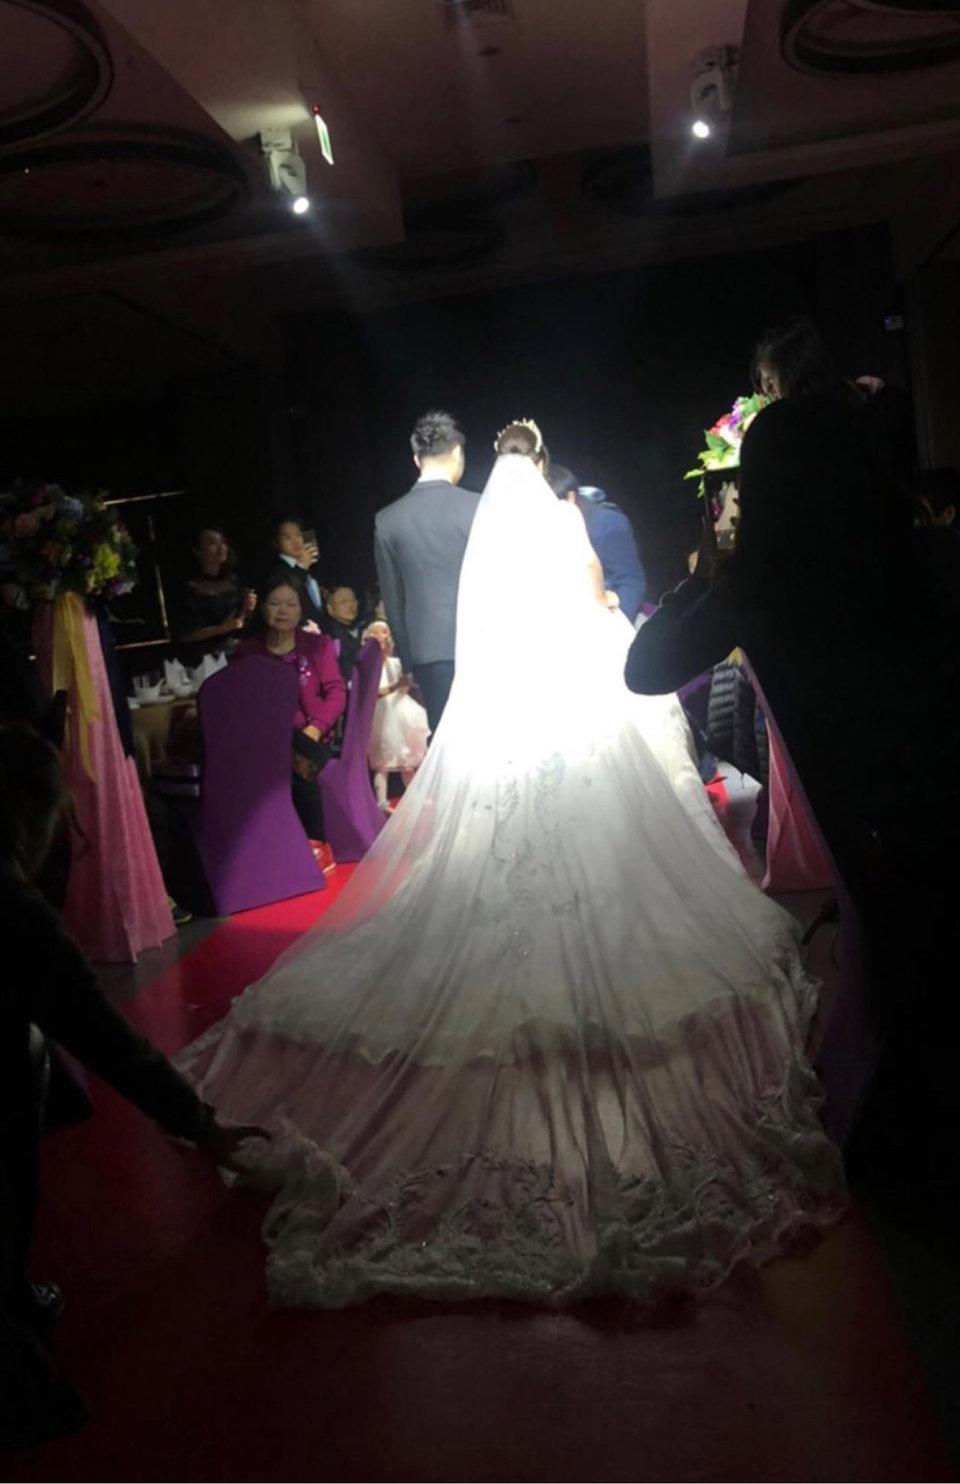 HappinessVillage,專業積極、親戚誠懇!完美婚禮最好的工作團隊之一、獻給所有新人最真實的評價